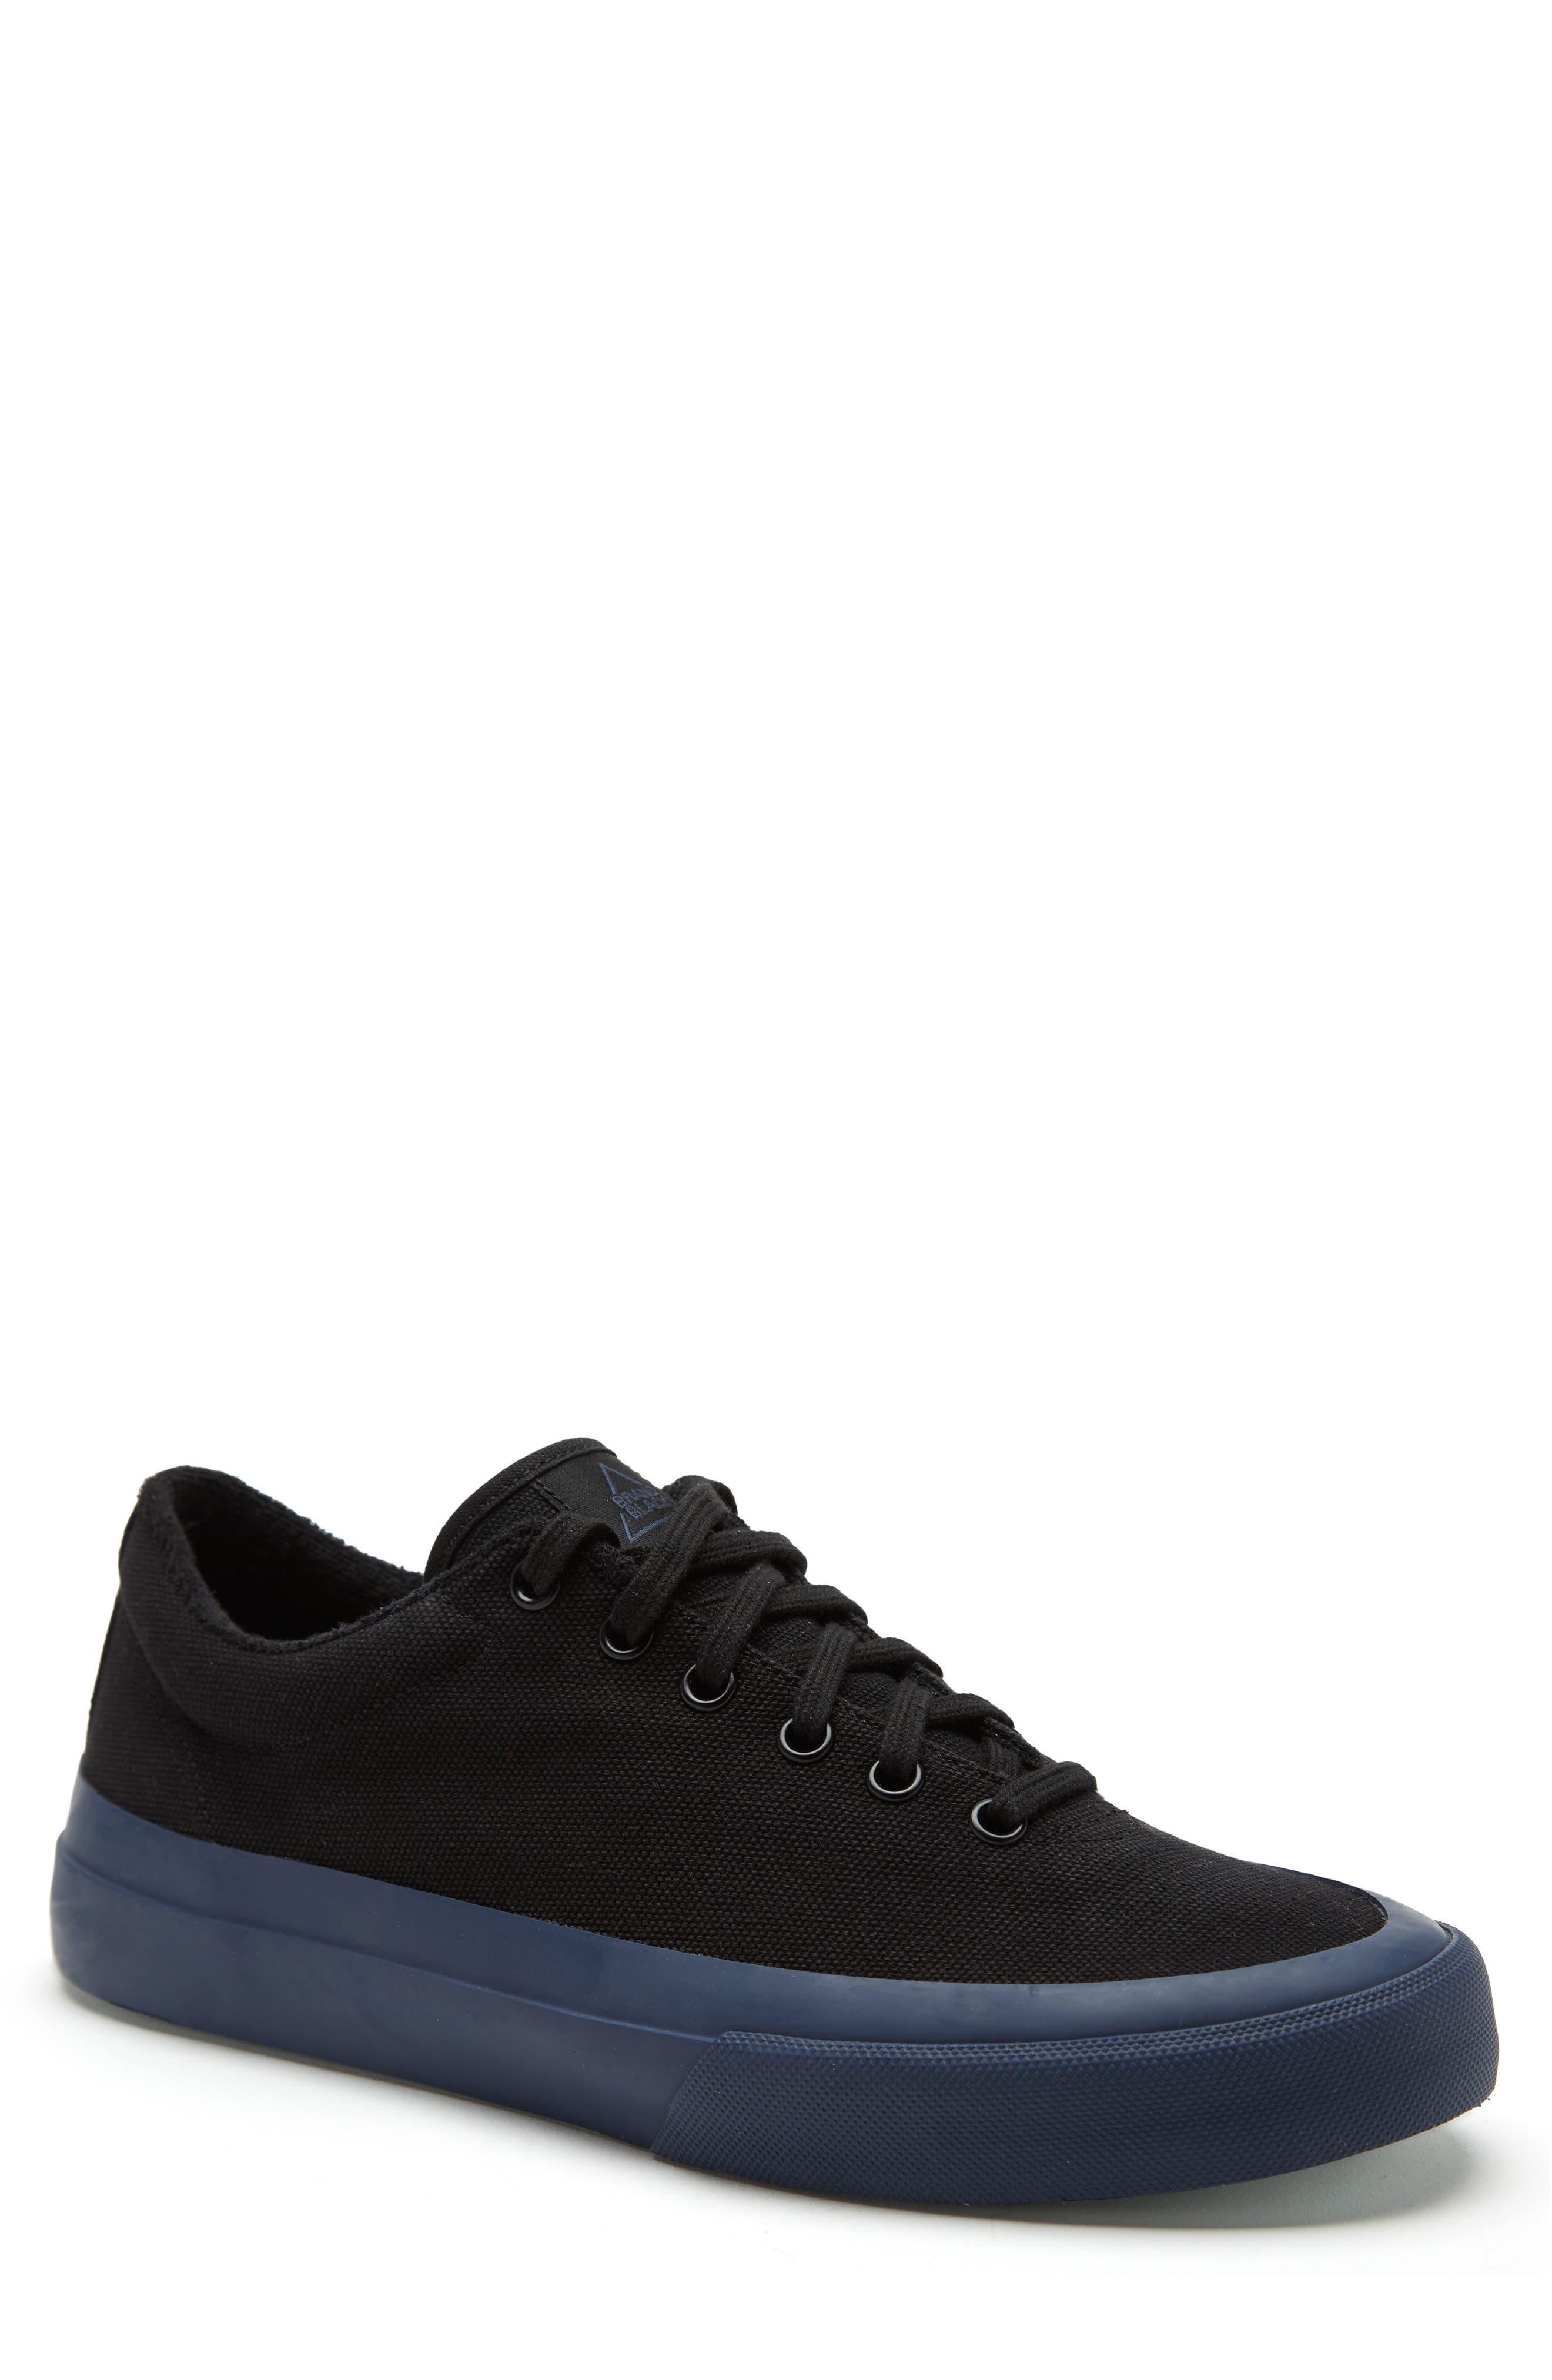 Vesta Low Top Sneaker,                         Main,                         color, BLACK/ NAVY